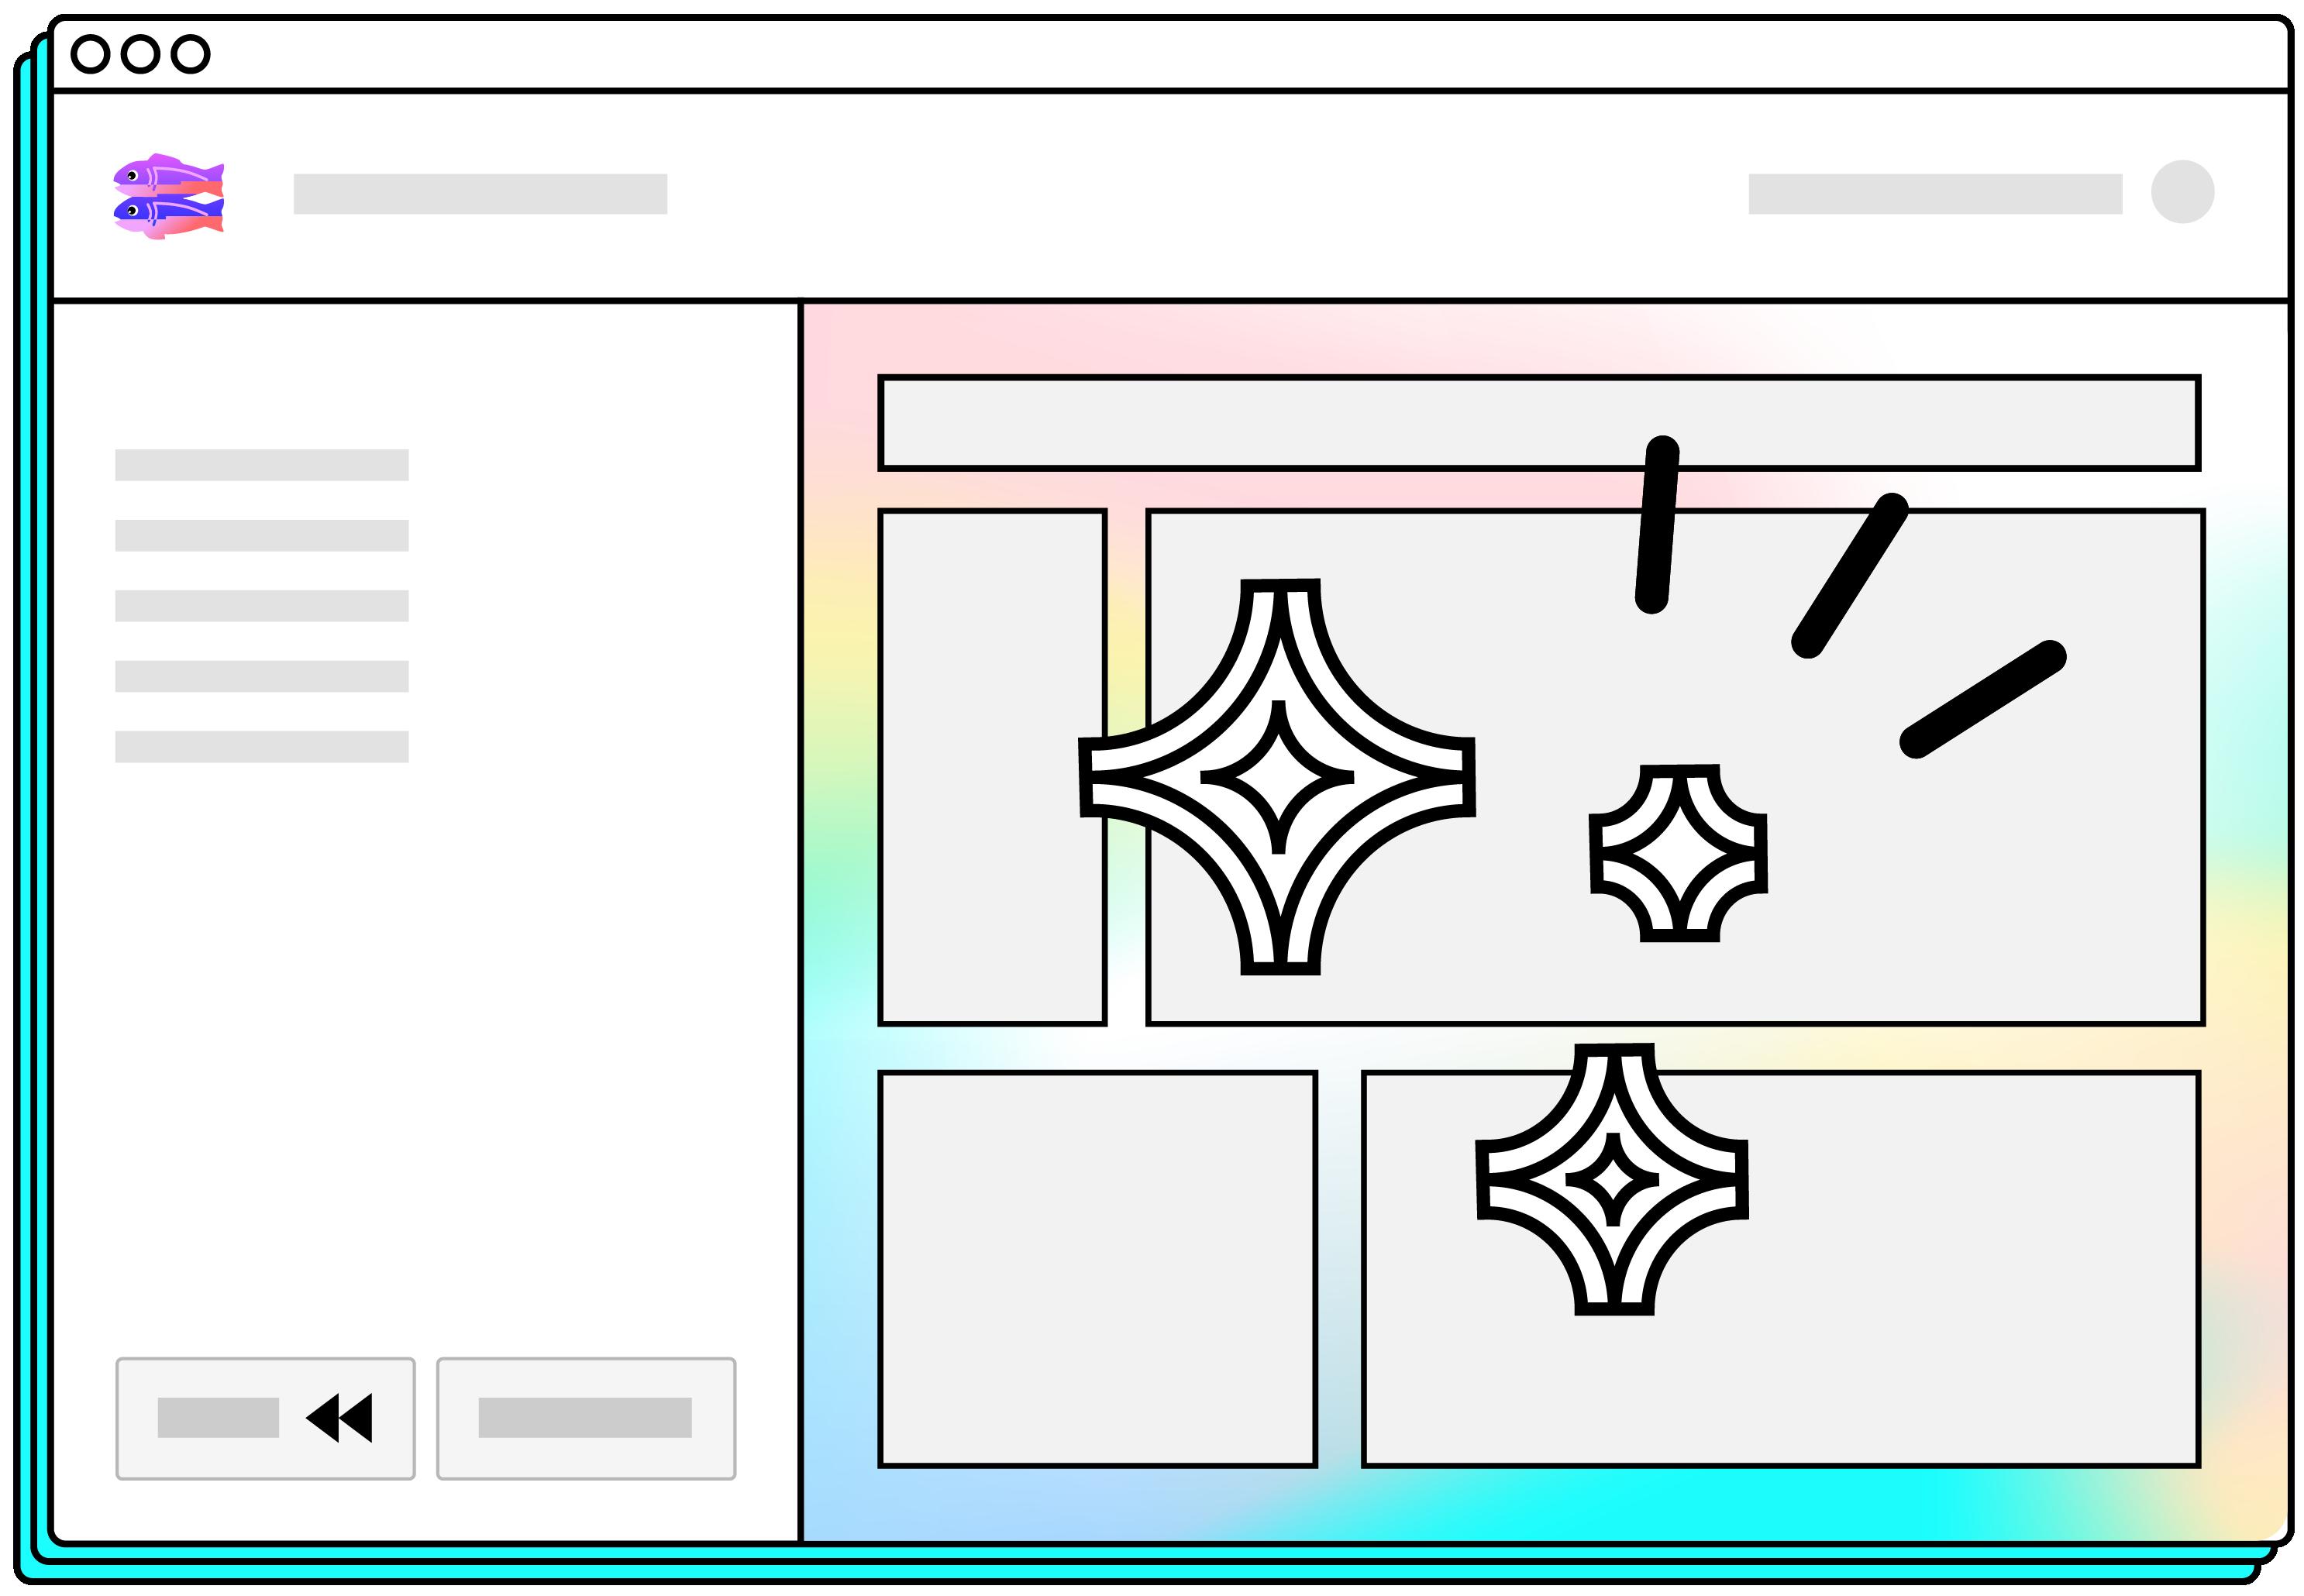 Glitch code editor